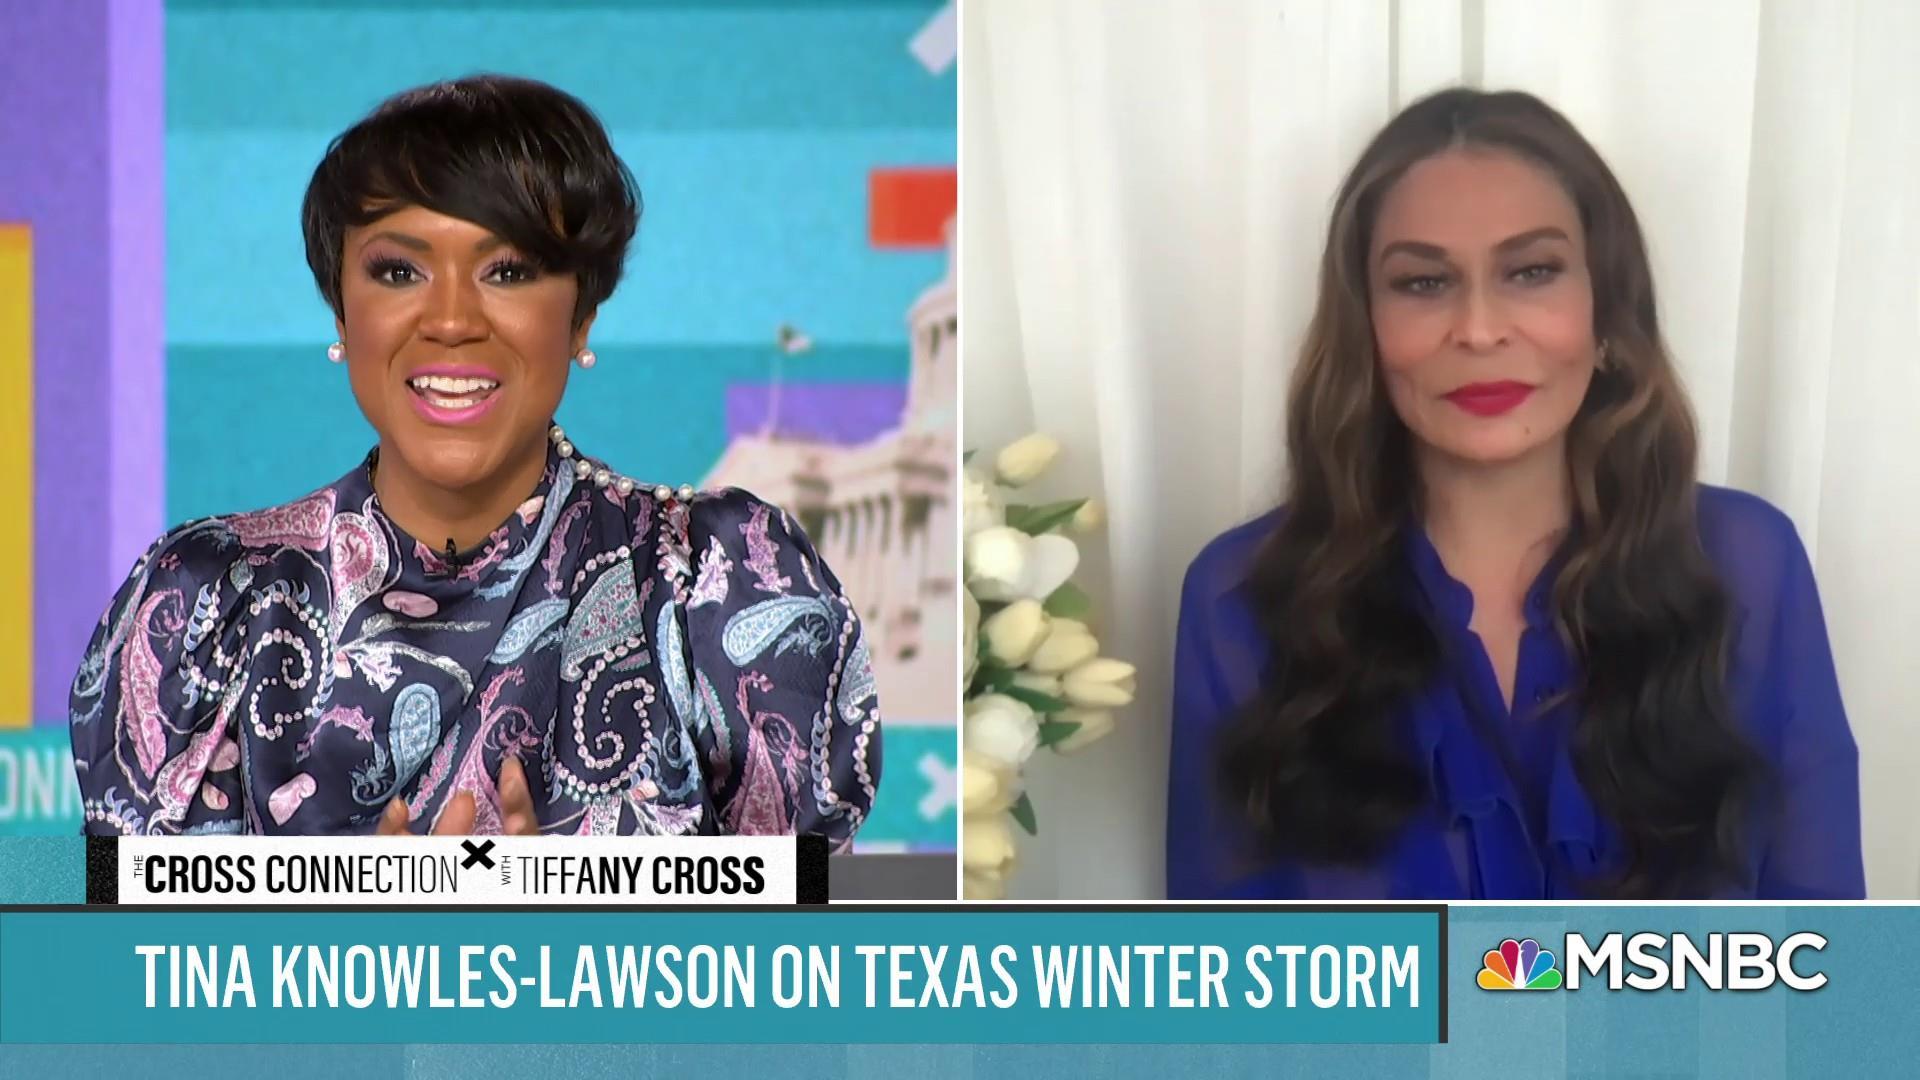 news.yahoo.com: Beyoncé's mother, social justice activist Tina Knowles-Lawson, decries racial injustices in policing and sentencing